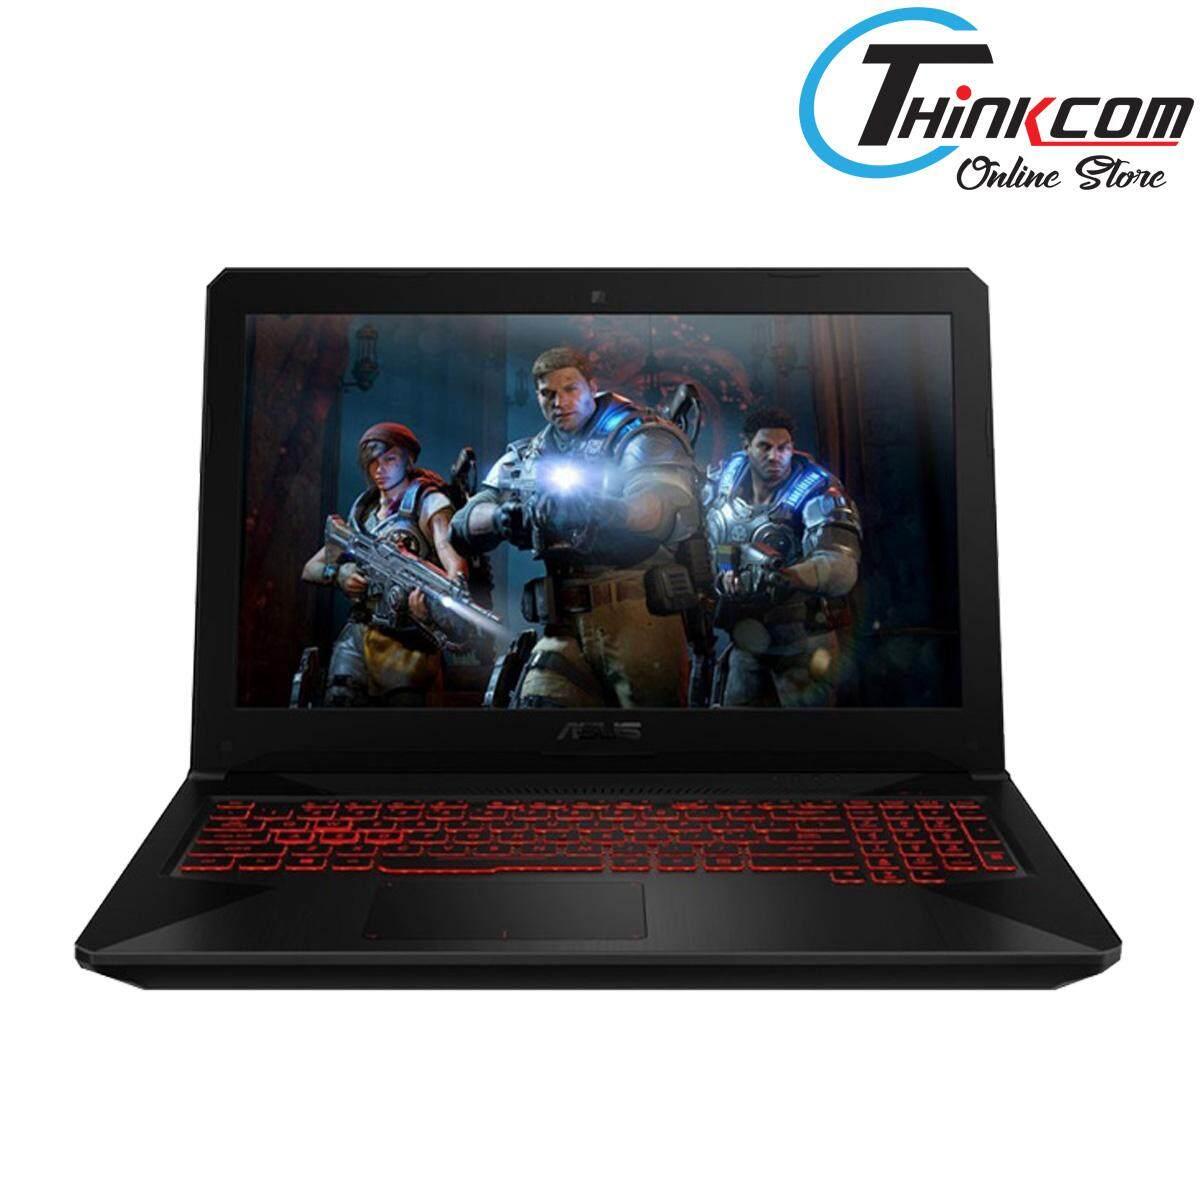 Asus TUF FX504G-DDM491T 15.6 FHD Gaming Laptop Premium Steel (I5-8300H, 4GB, 1TB, GTX1050 4GB, W10) Malaysia